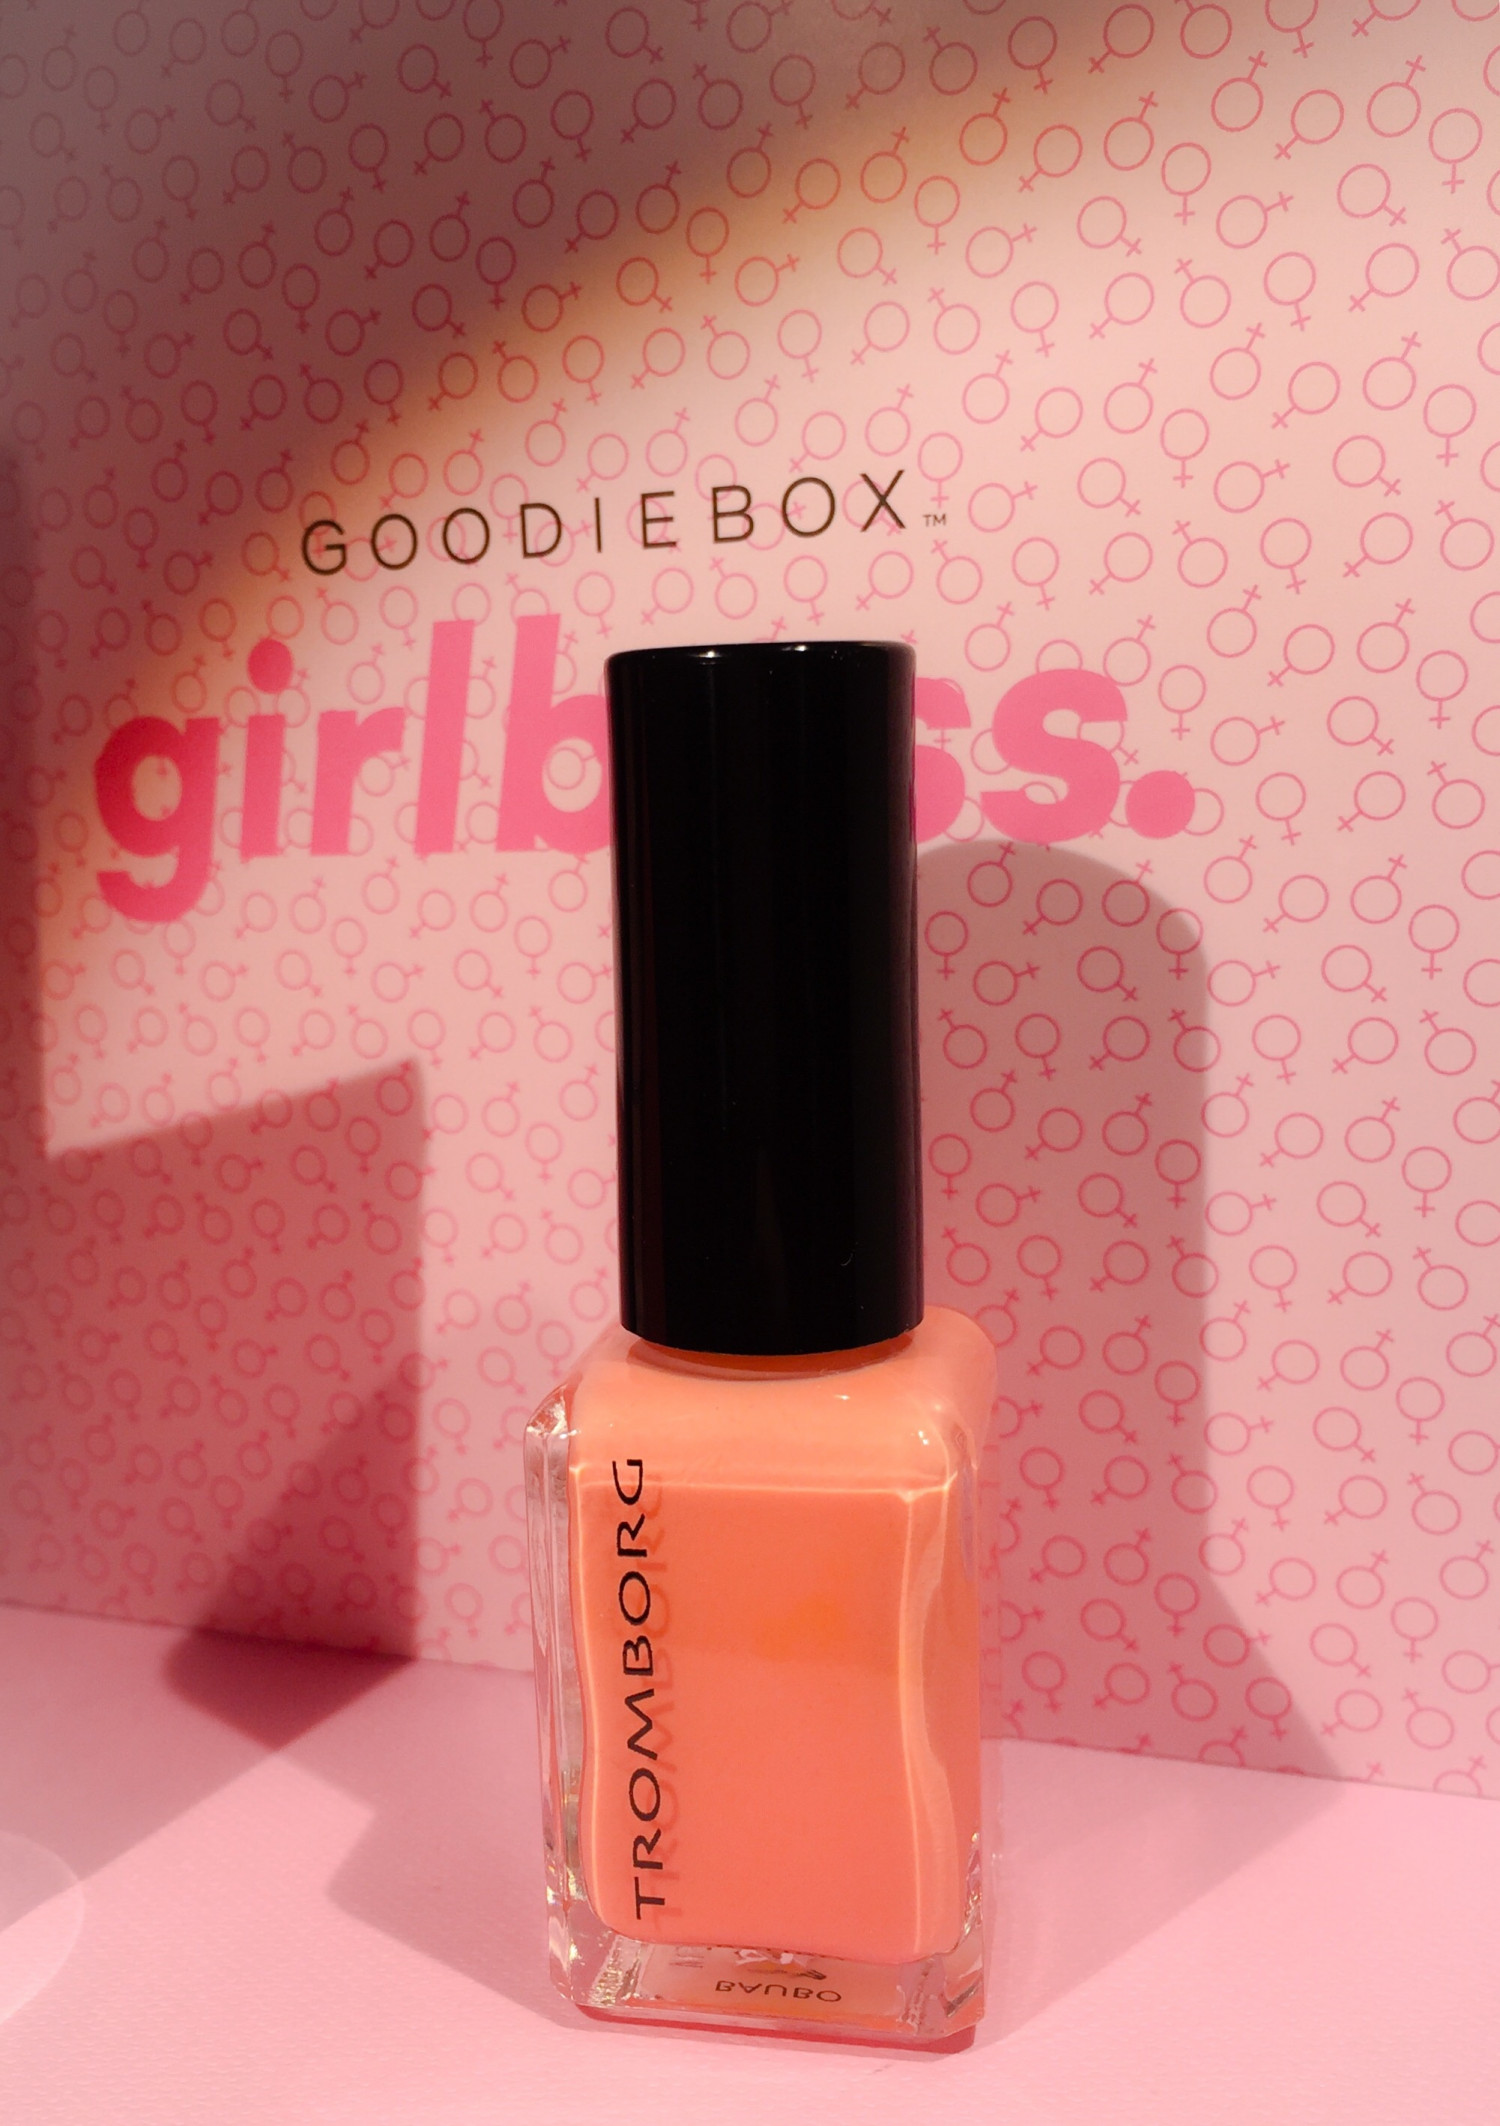 Goodiebox, Goodiebox.dk, Goodiebox Danmark,